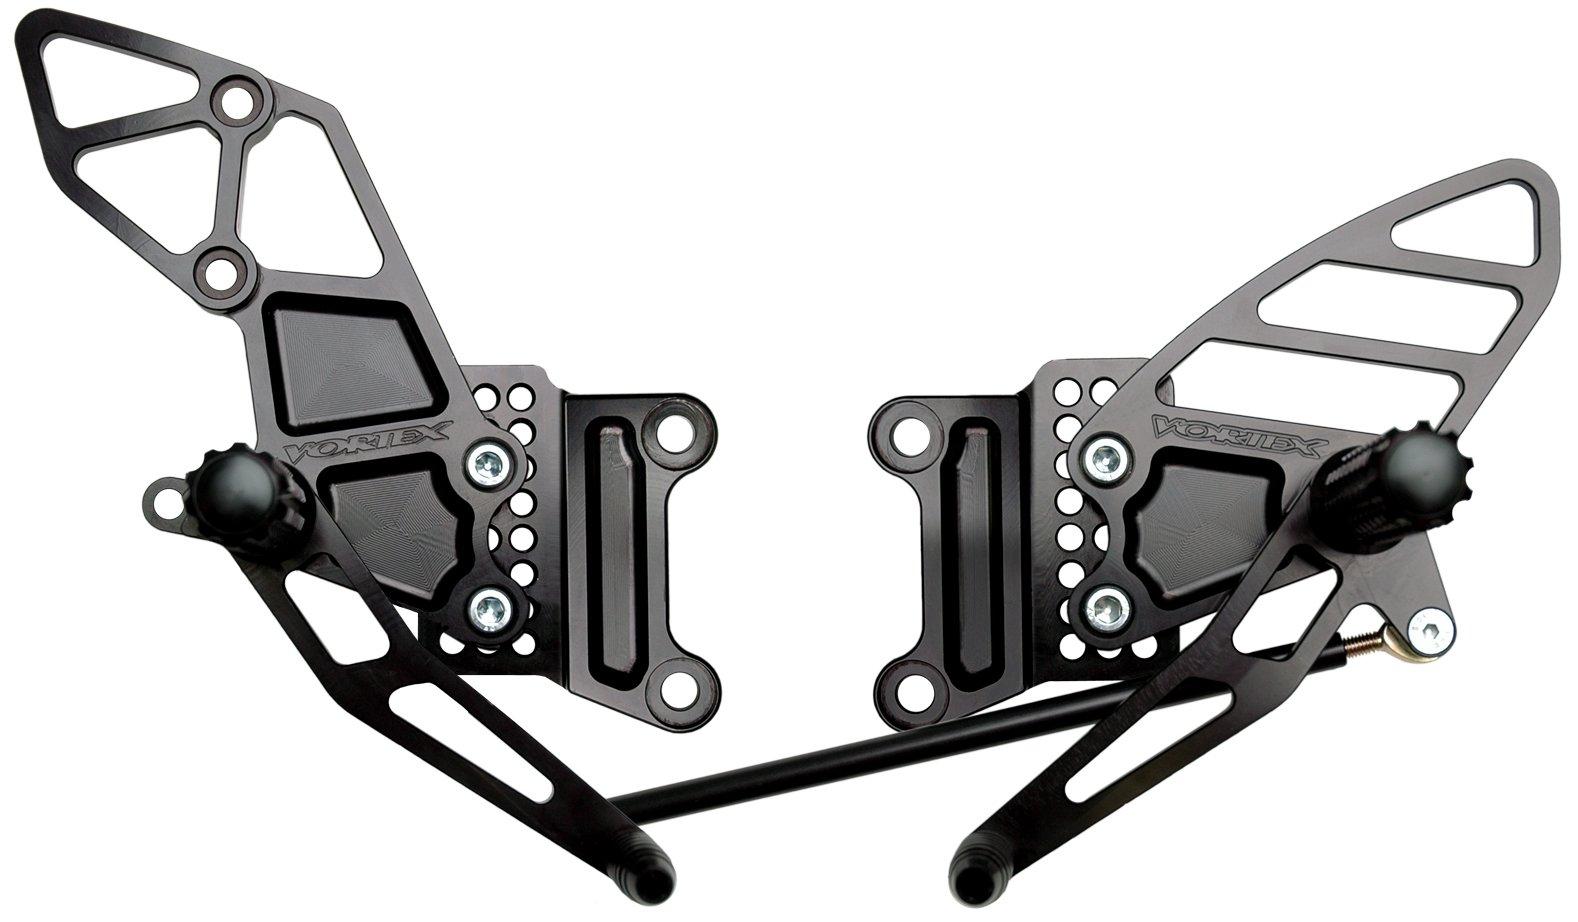 Vortex RS407K Black Rear Set